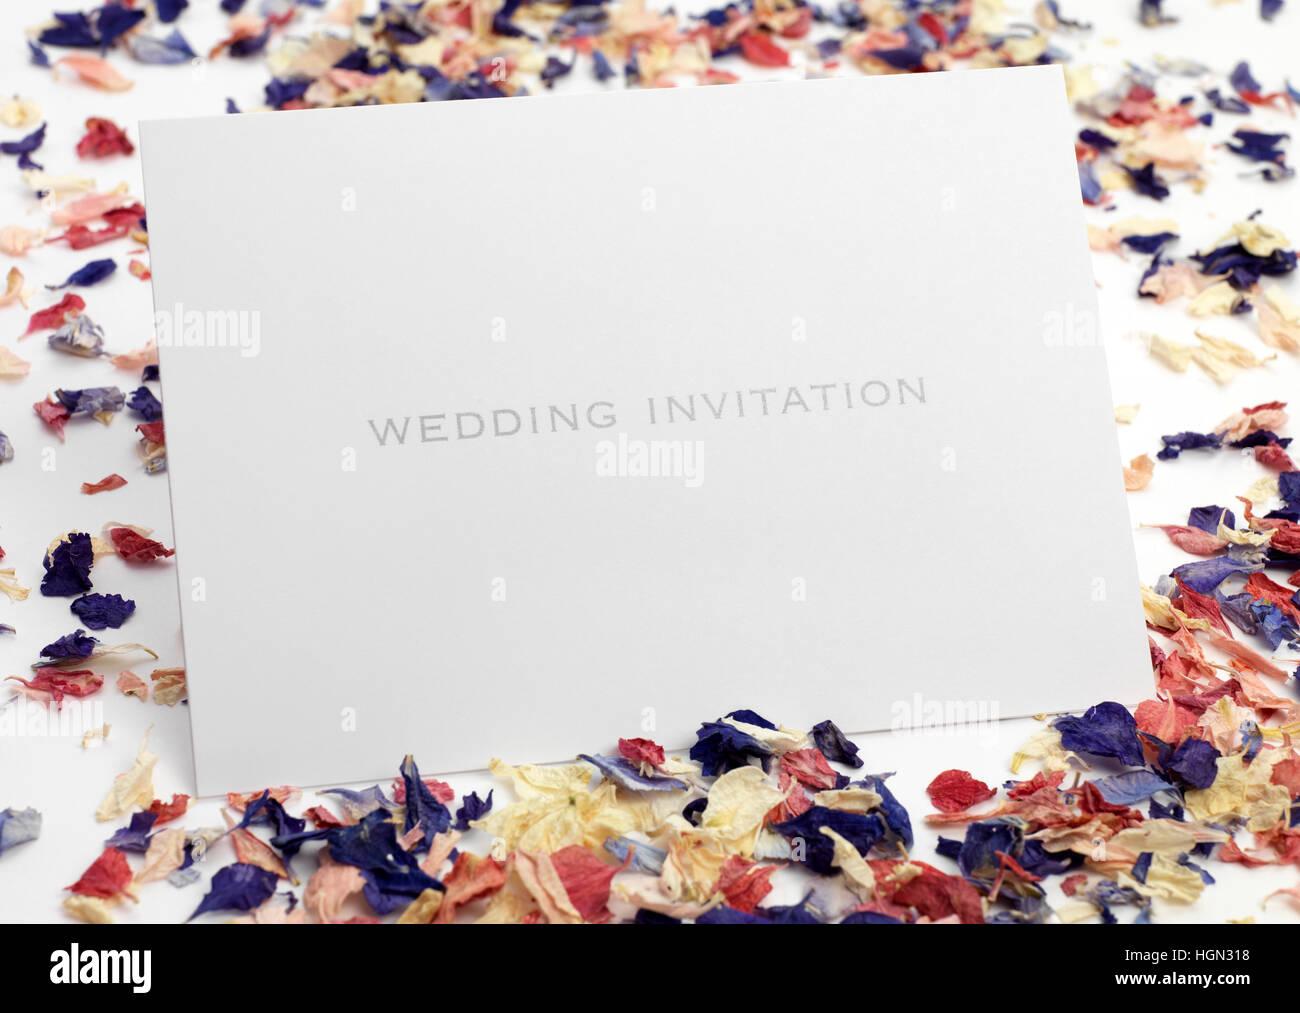 Bride and Groom wedding invitation Stock Photo, Royalty Free Image ...